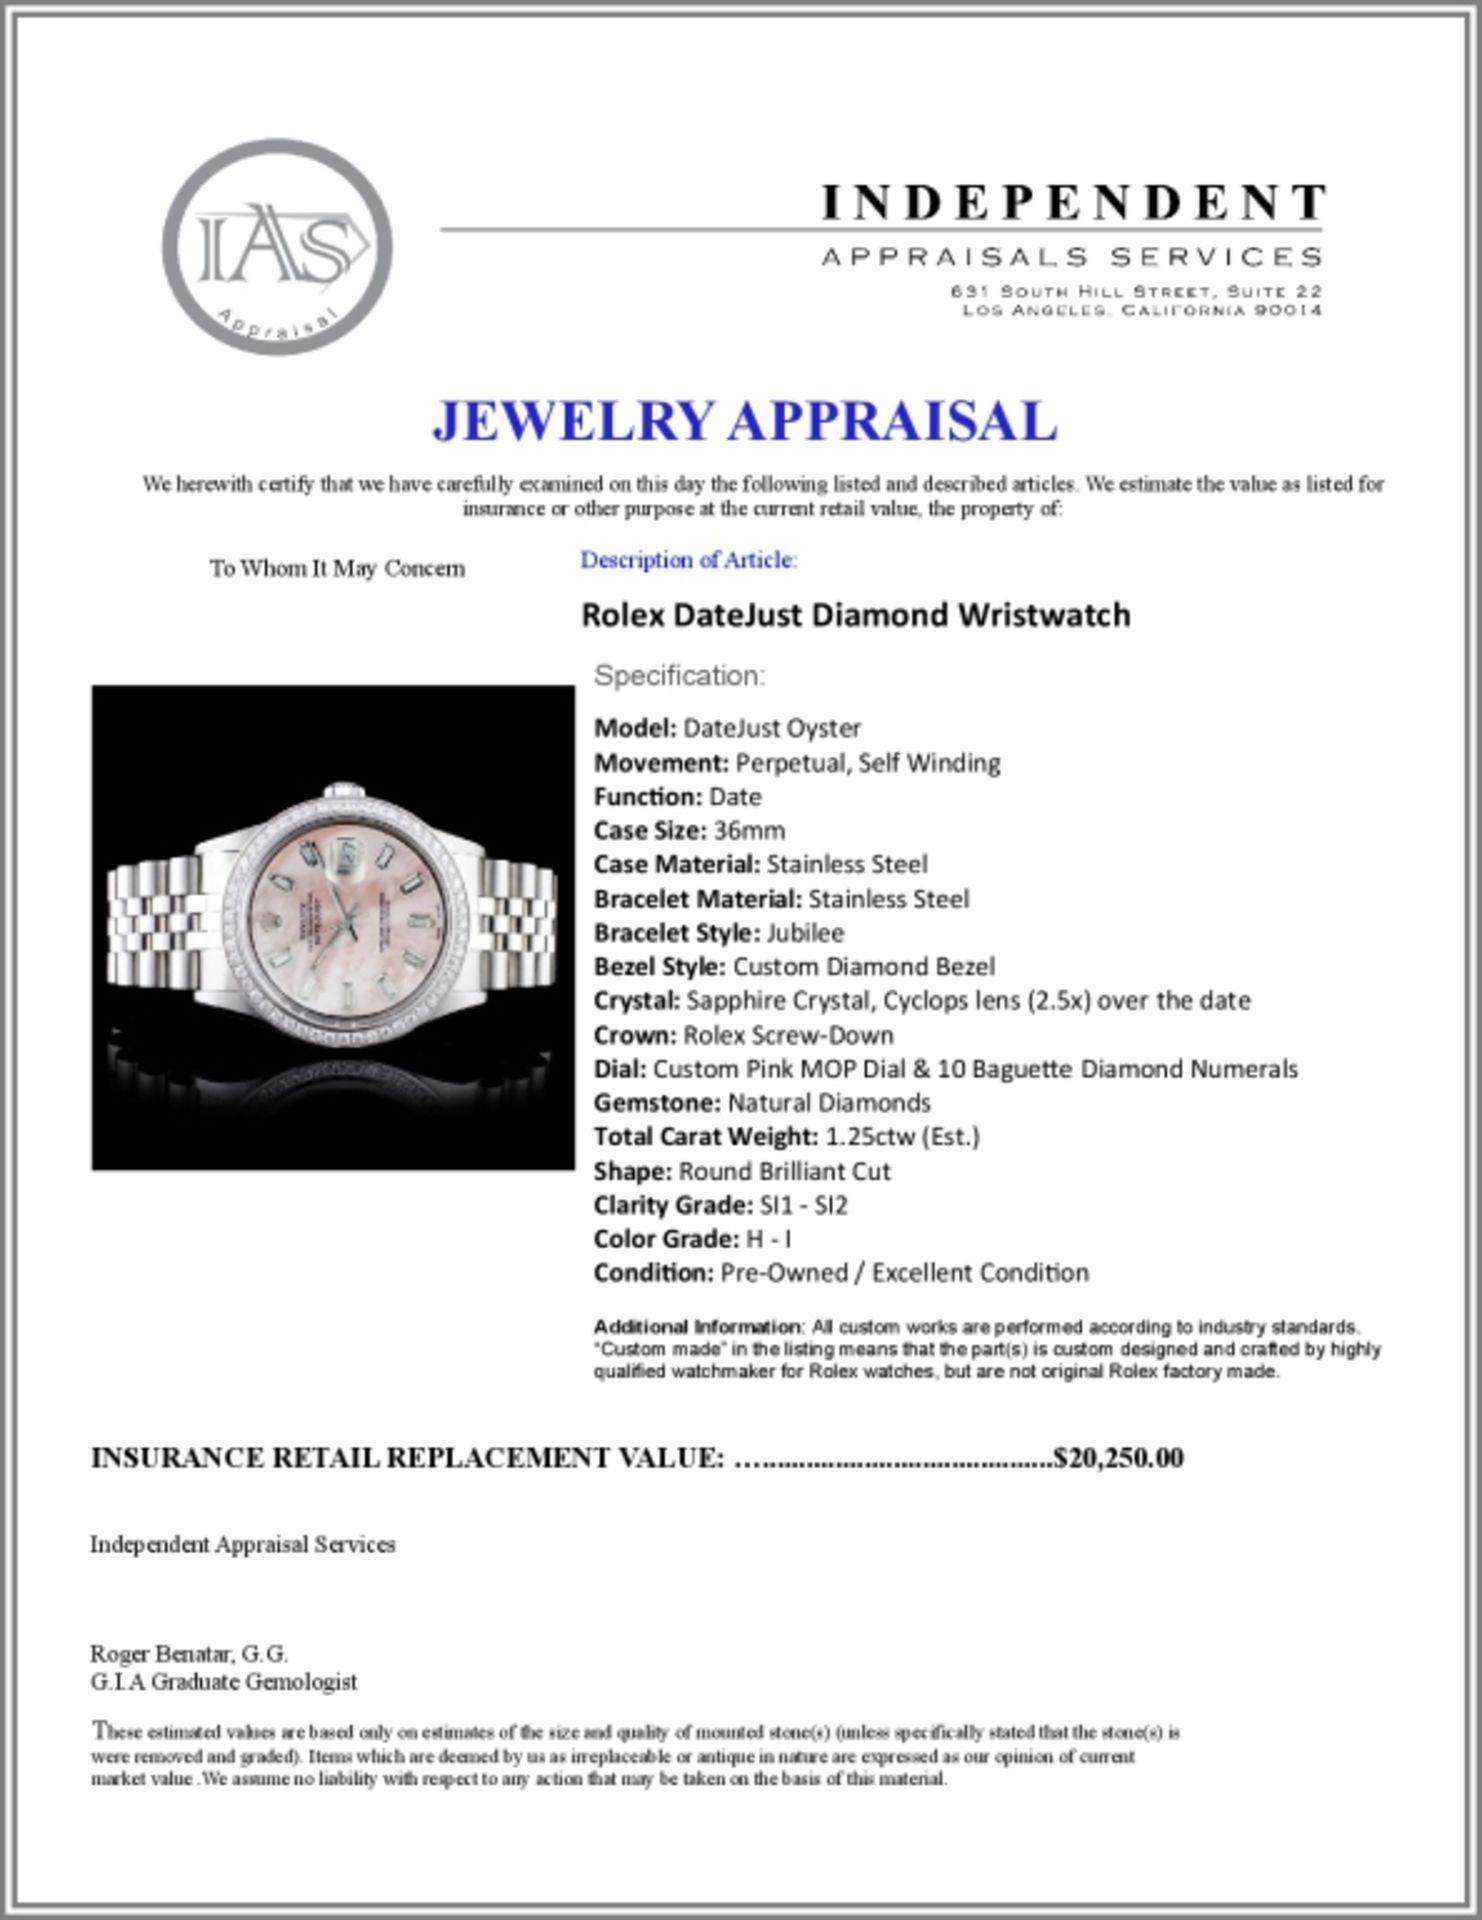 Rolex DateJust Diamond 36mm Wristwatch - Image 5 of 5